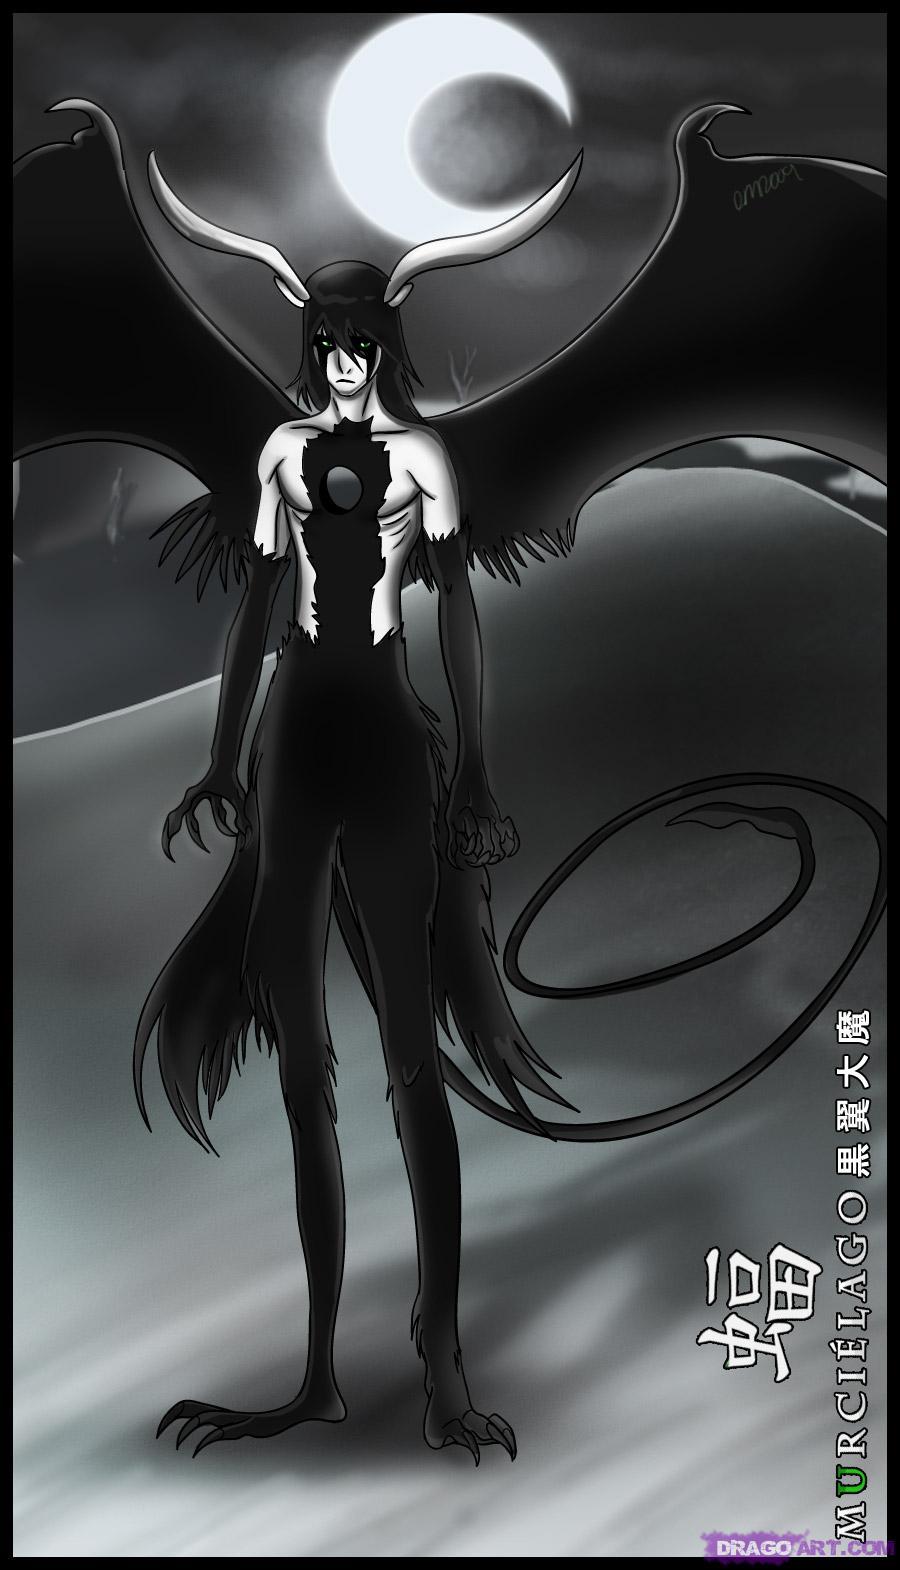 Ulquiorra Schiffer - BLEACH - Image #544094 - Zerochan Anime Image ...